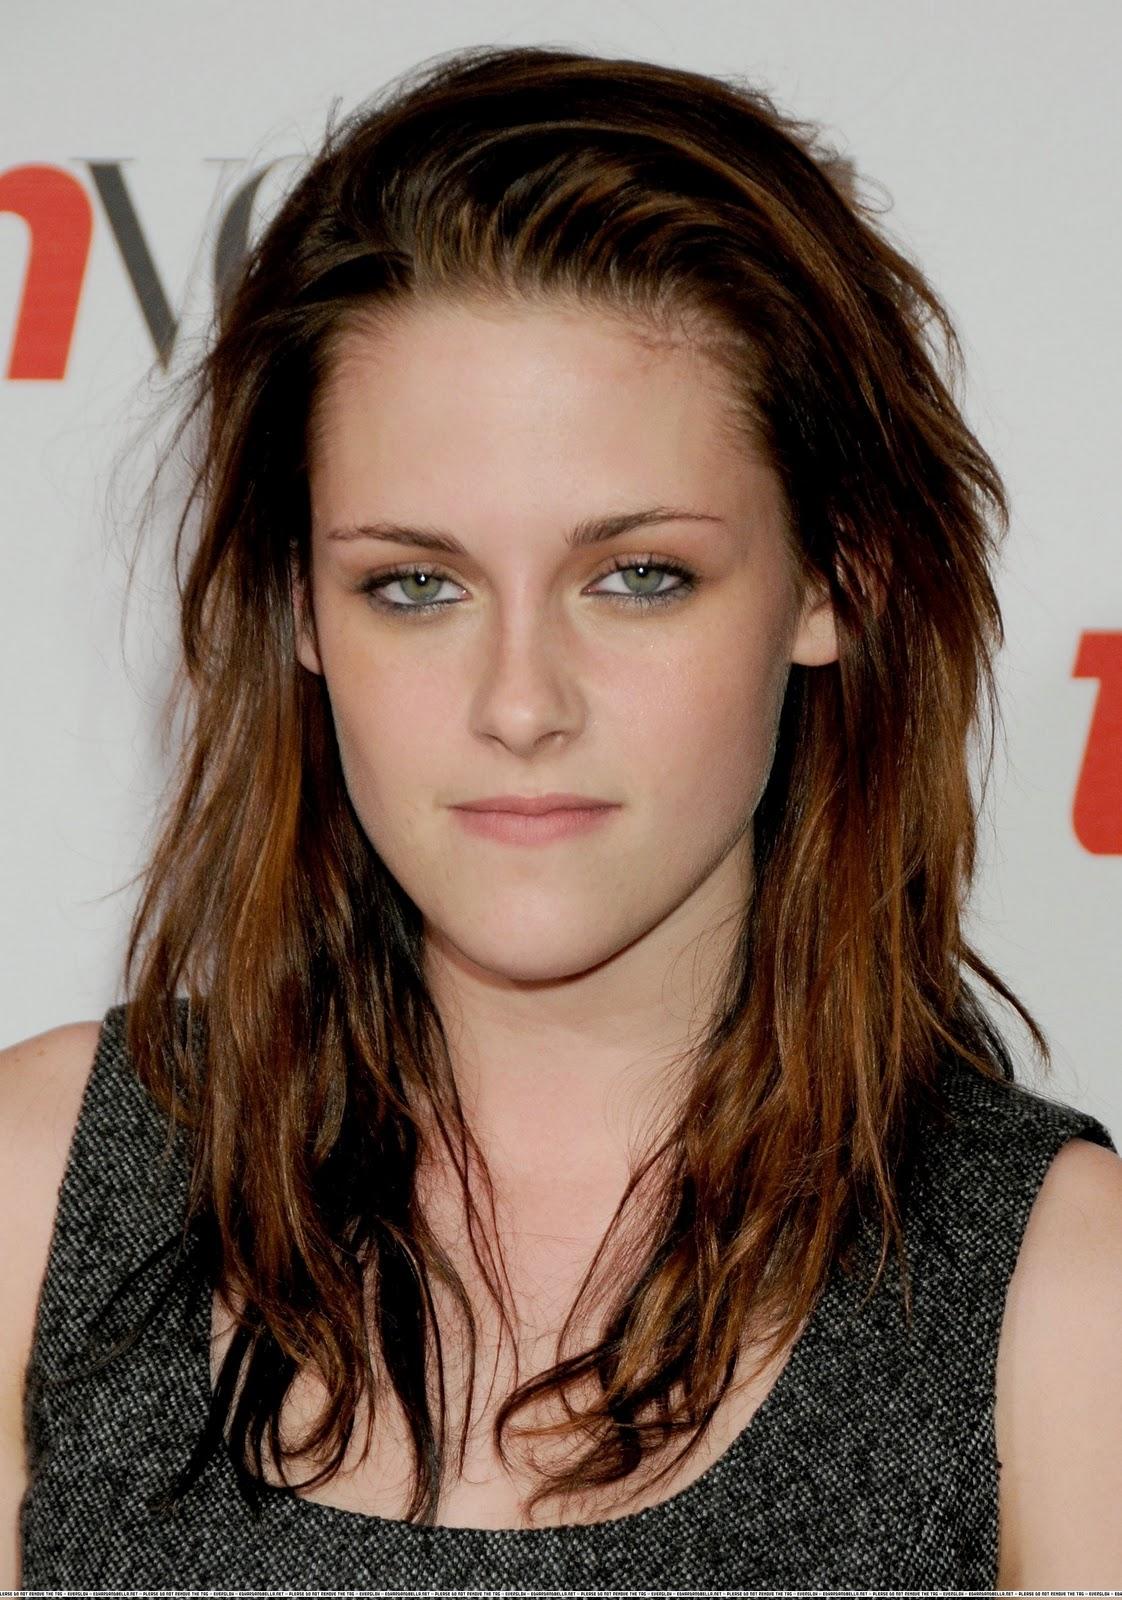 Bollyworld Twilight Girl Kristen Stewart Wants To Work